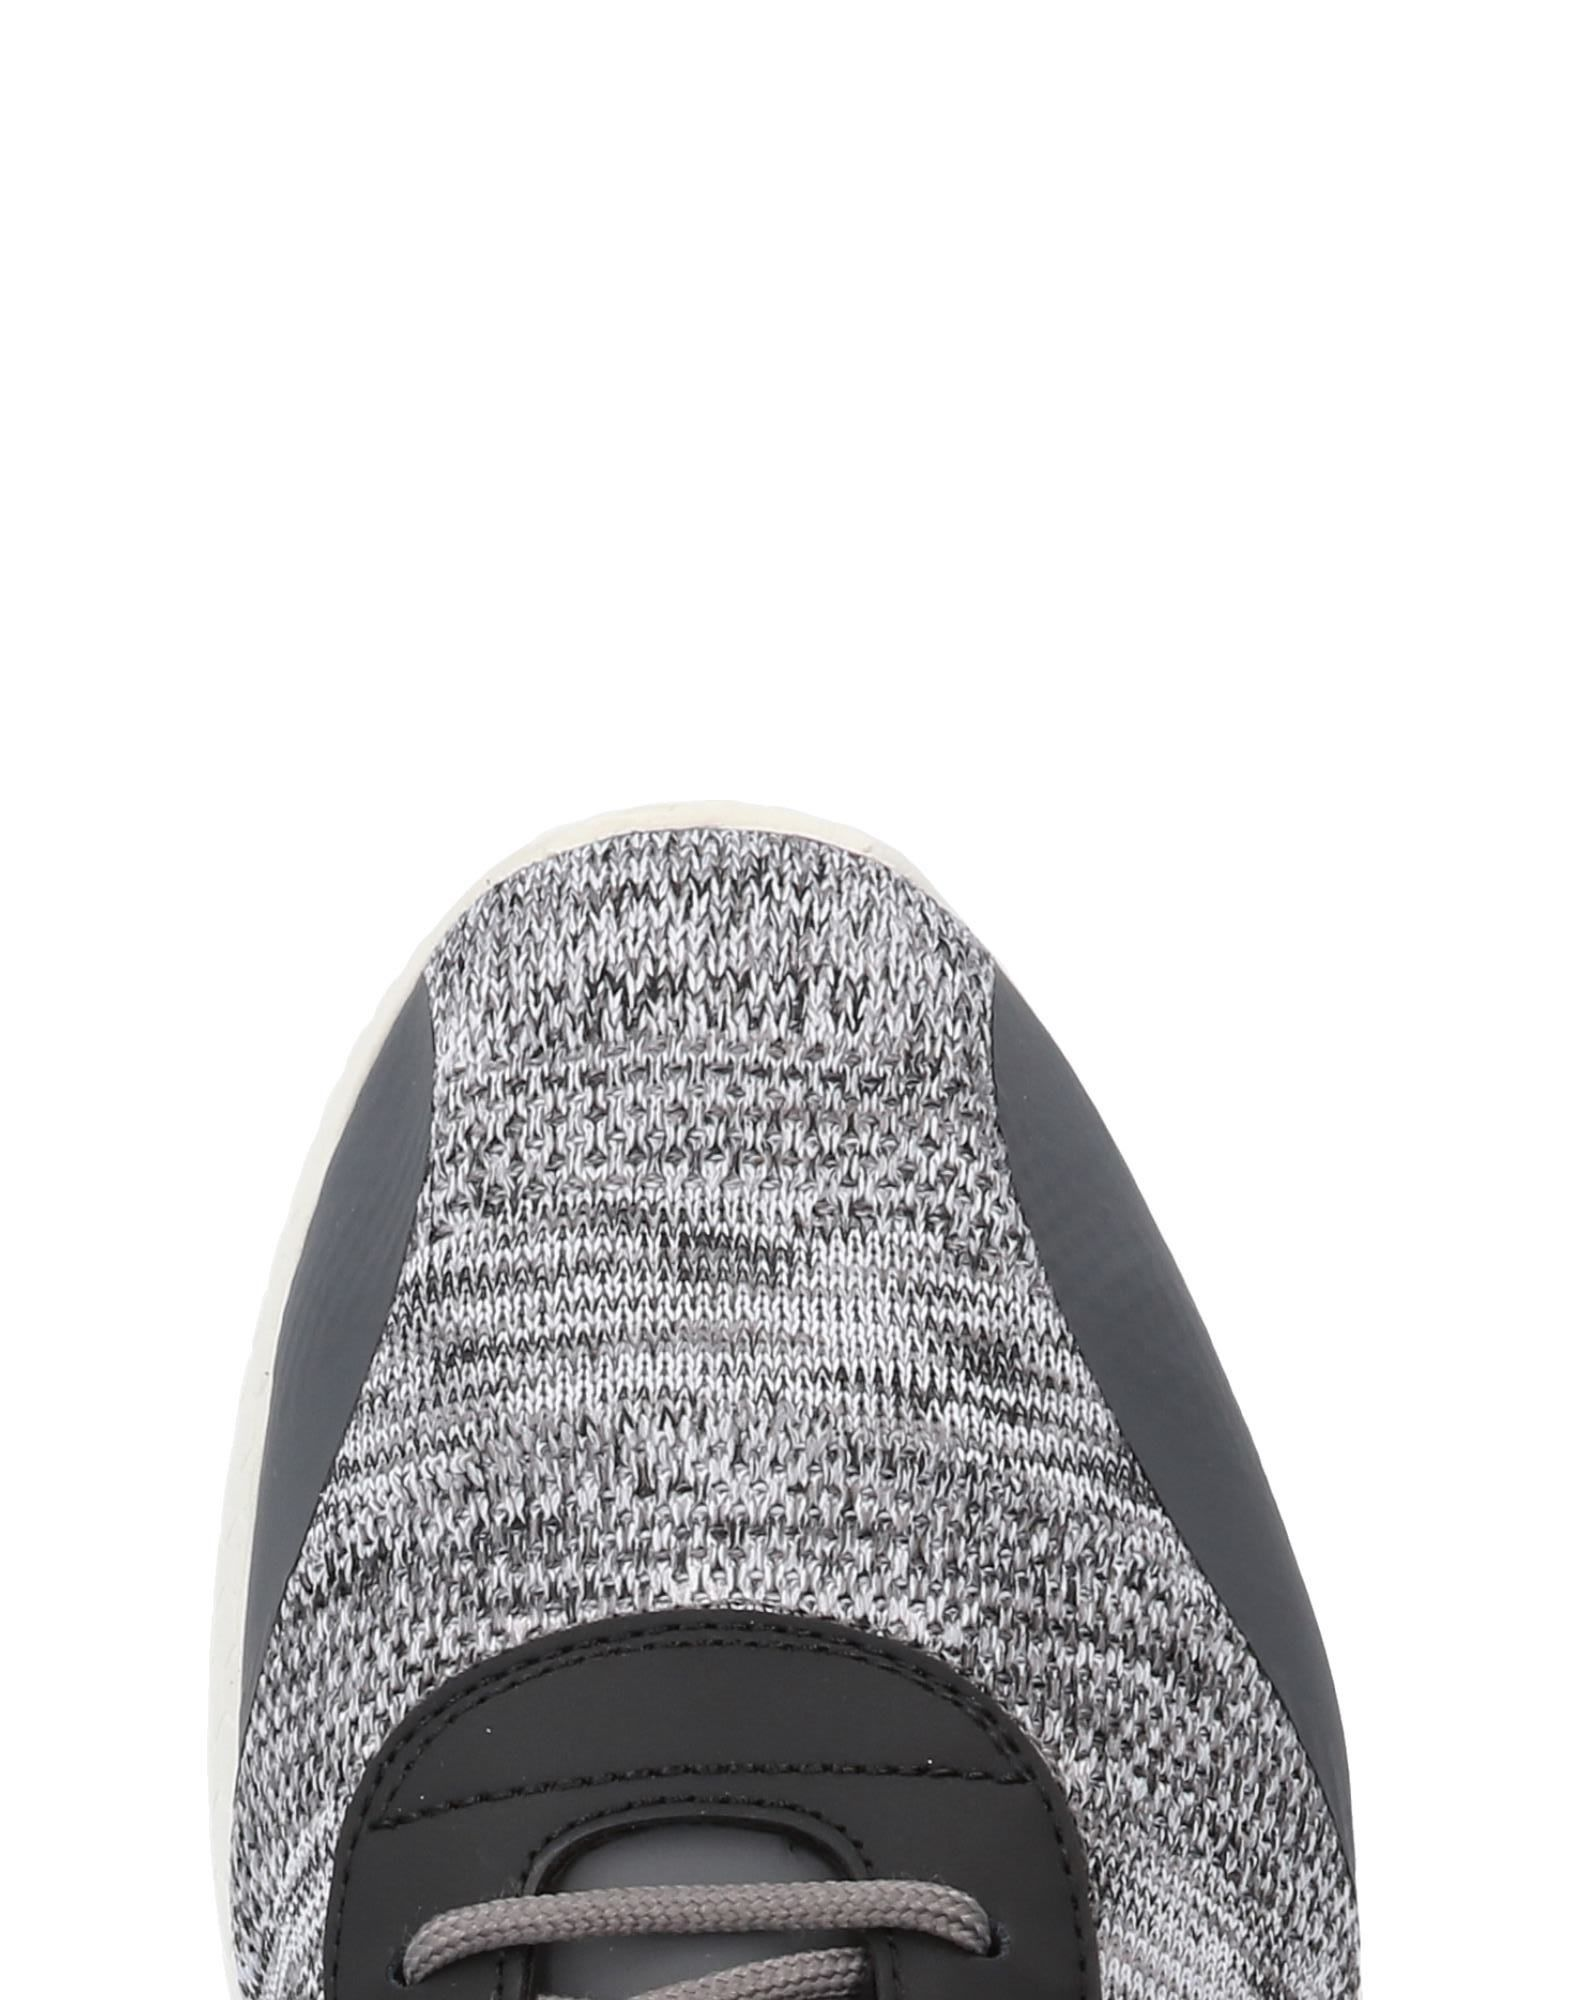 Bikkembergs Sneakers Herren  11449878AS Gute Qualität beliebte Schuhe